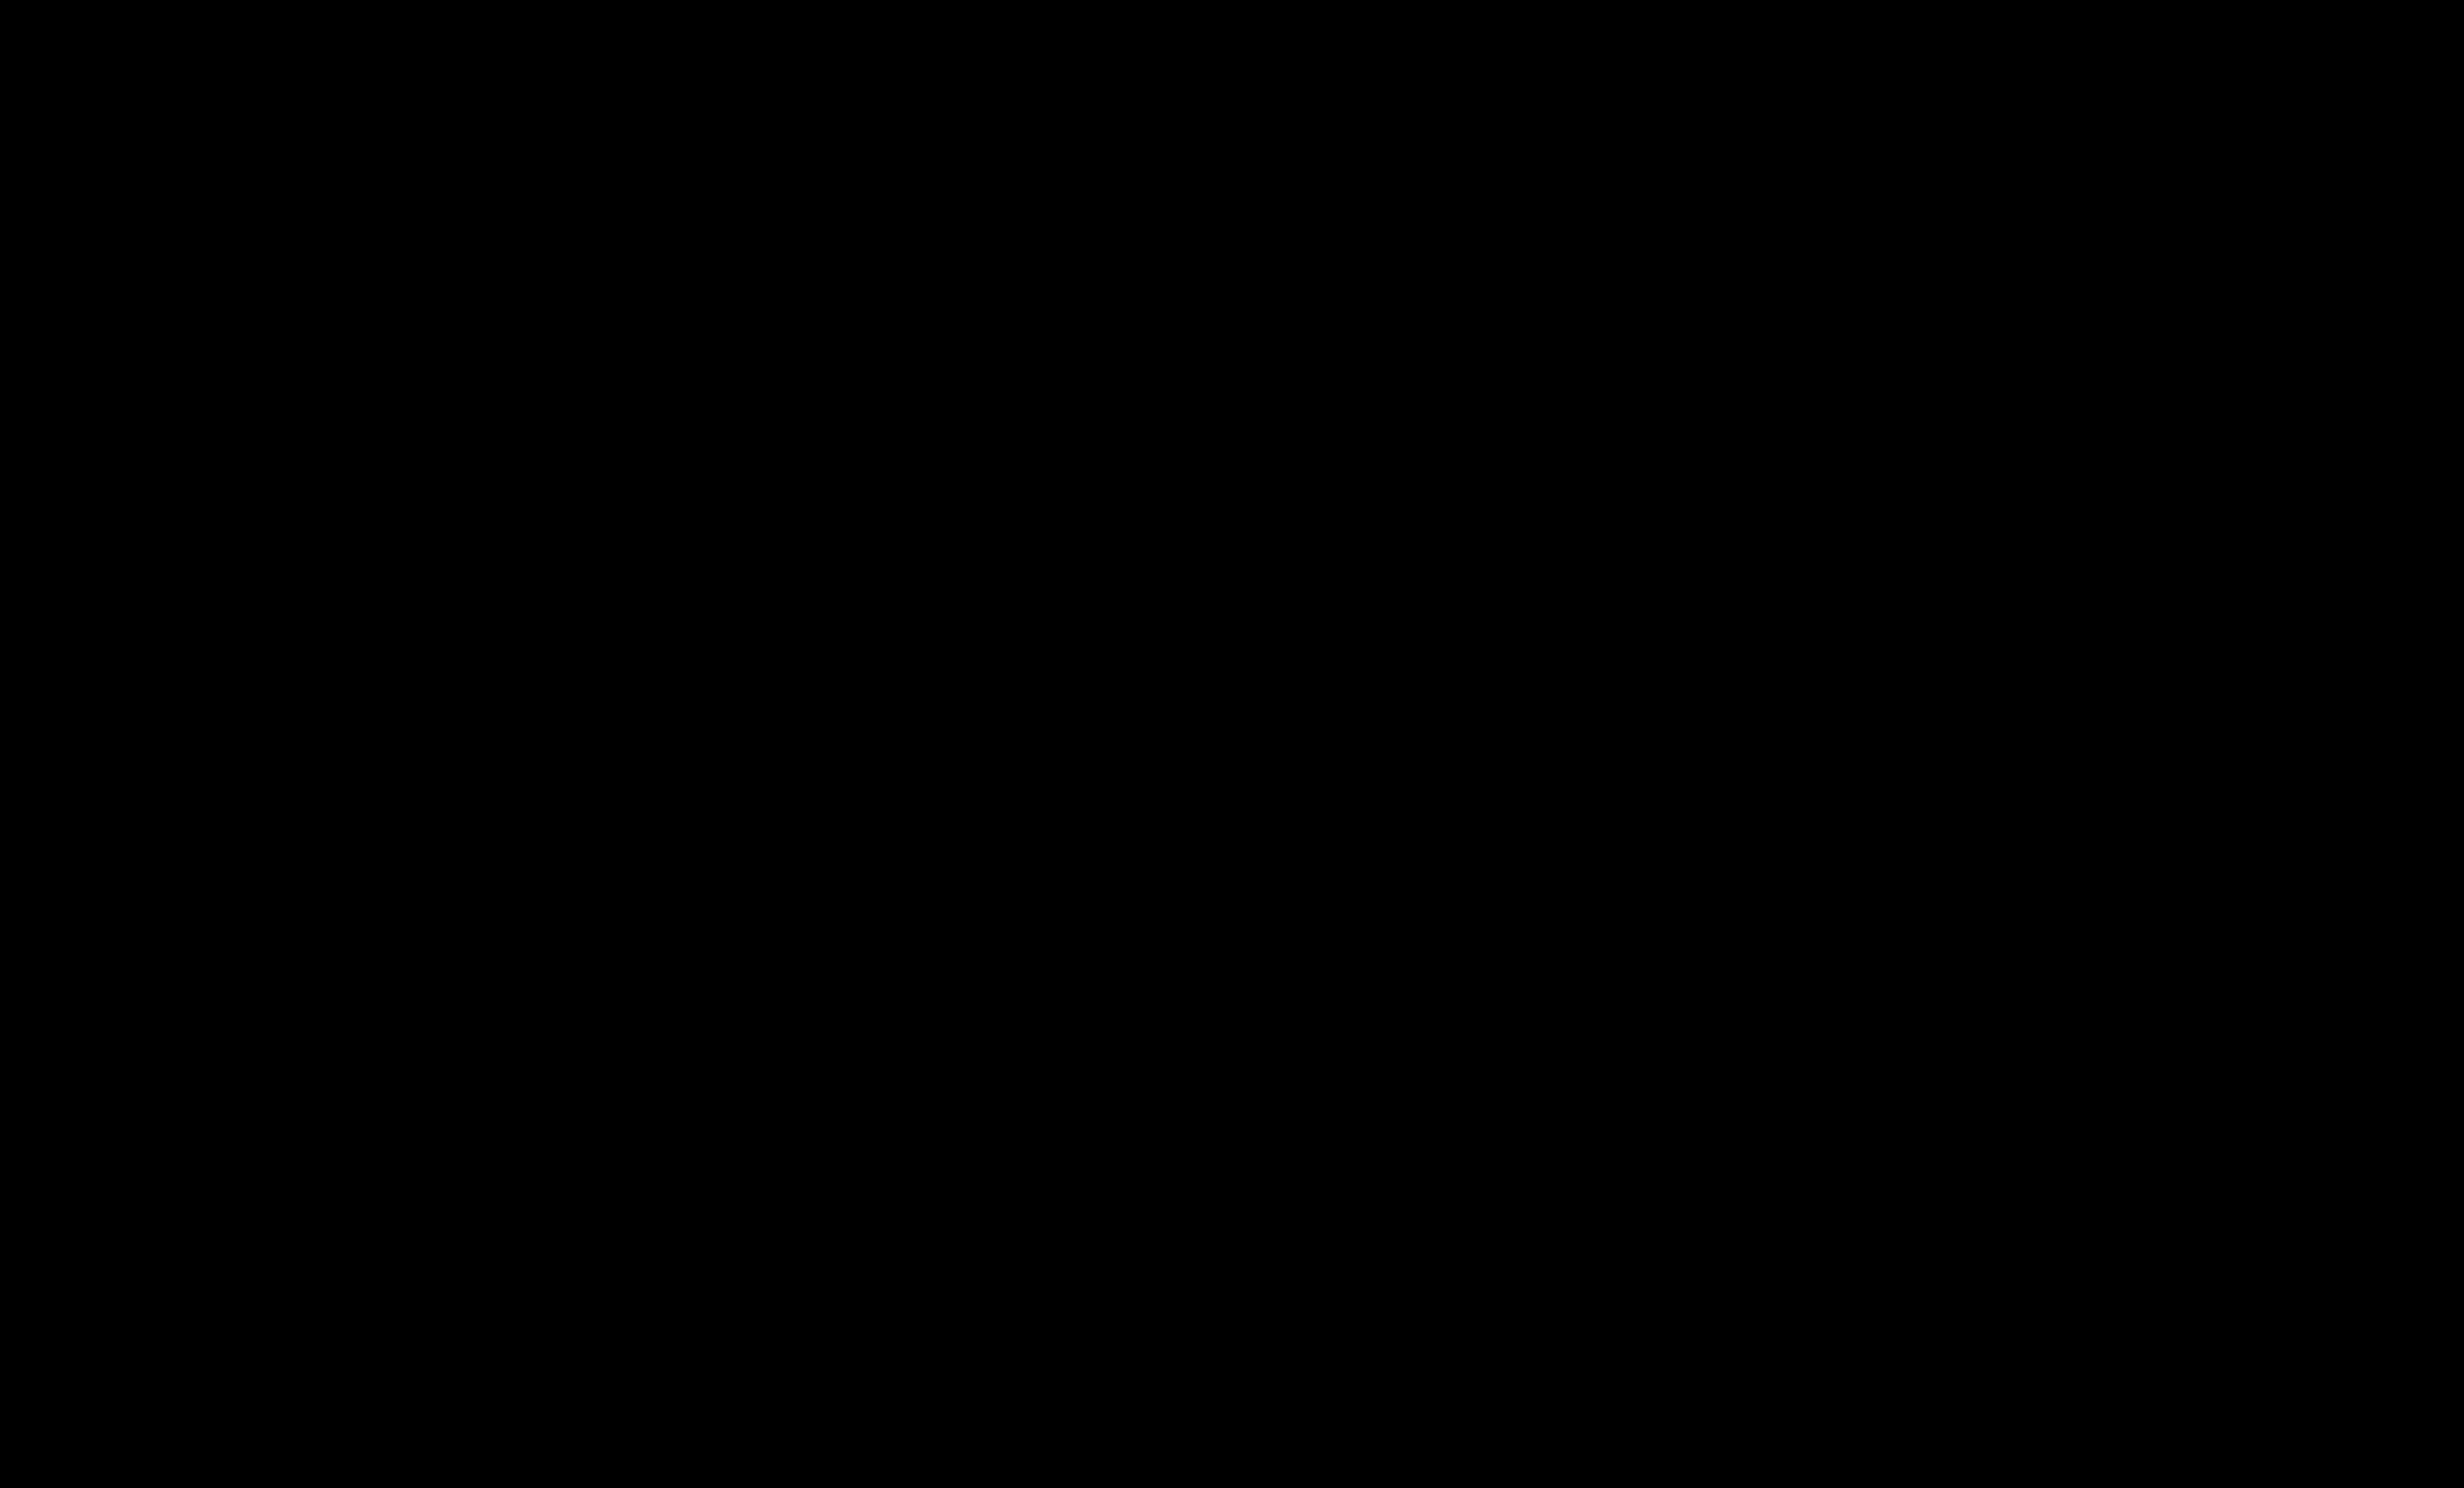 _2BP0586_A